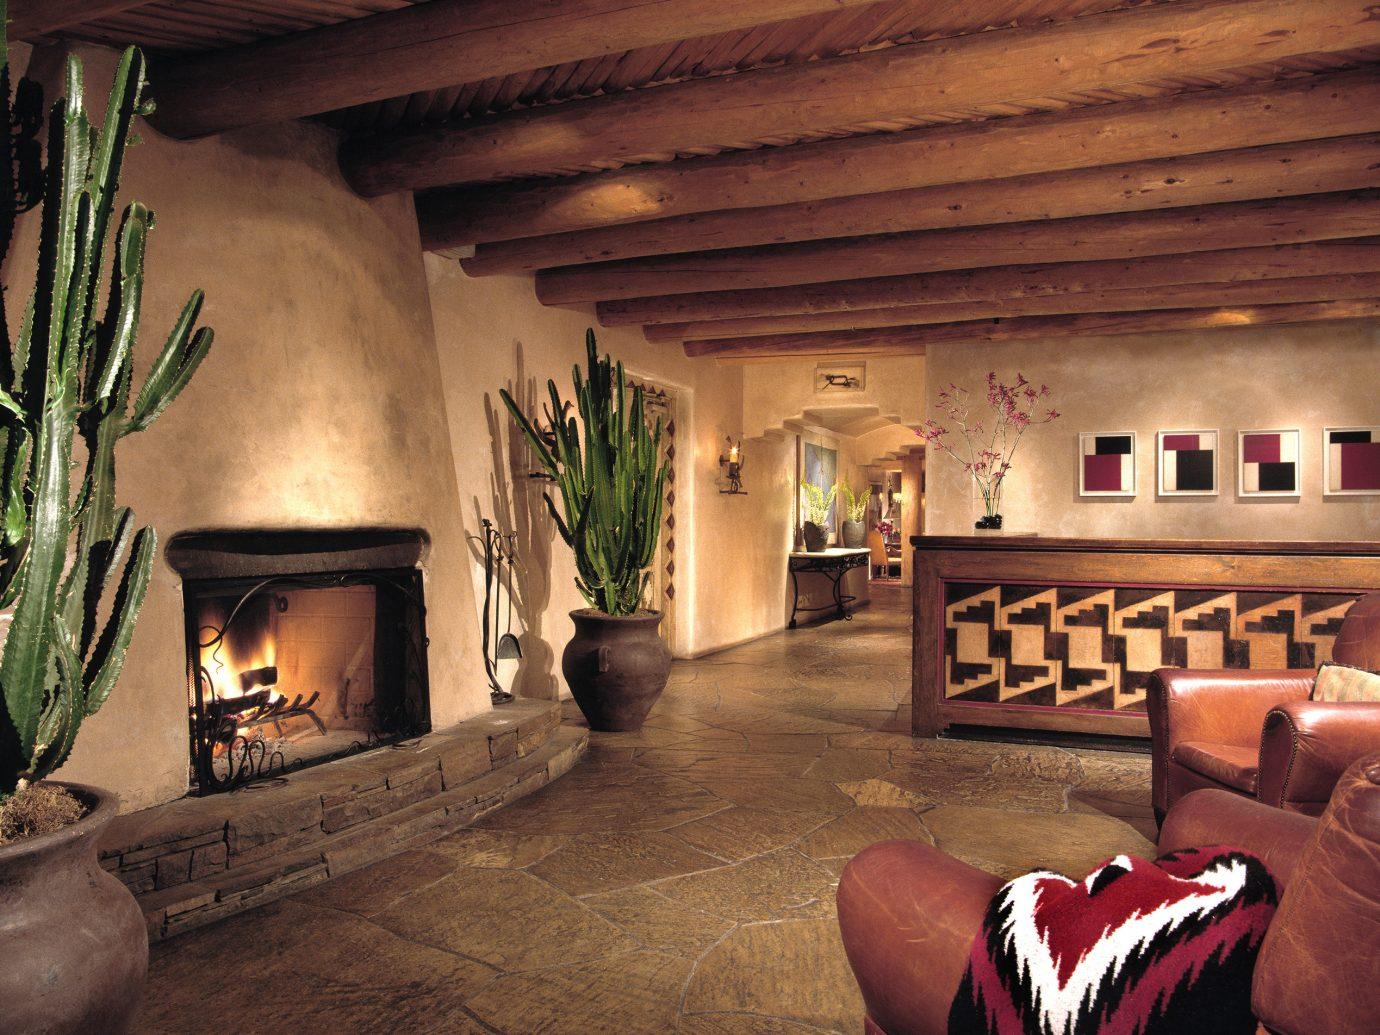 Lobby of Rosewood Inn of the Anasazi